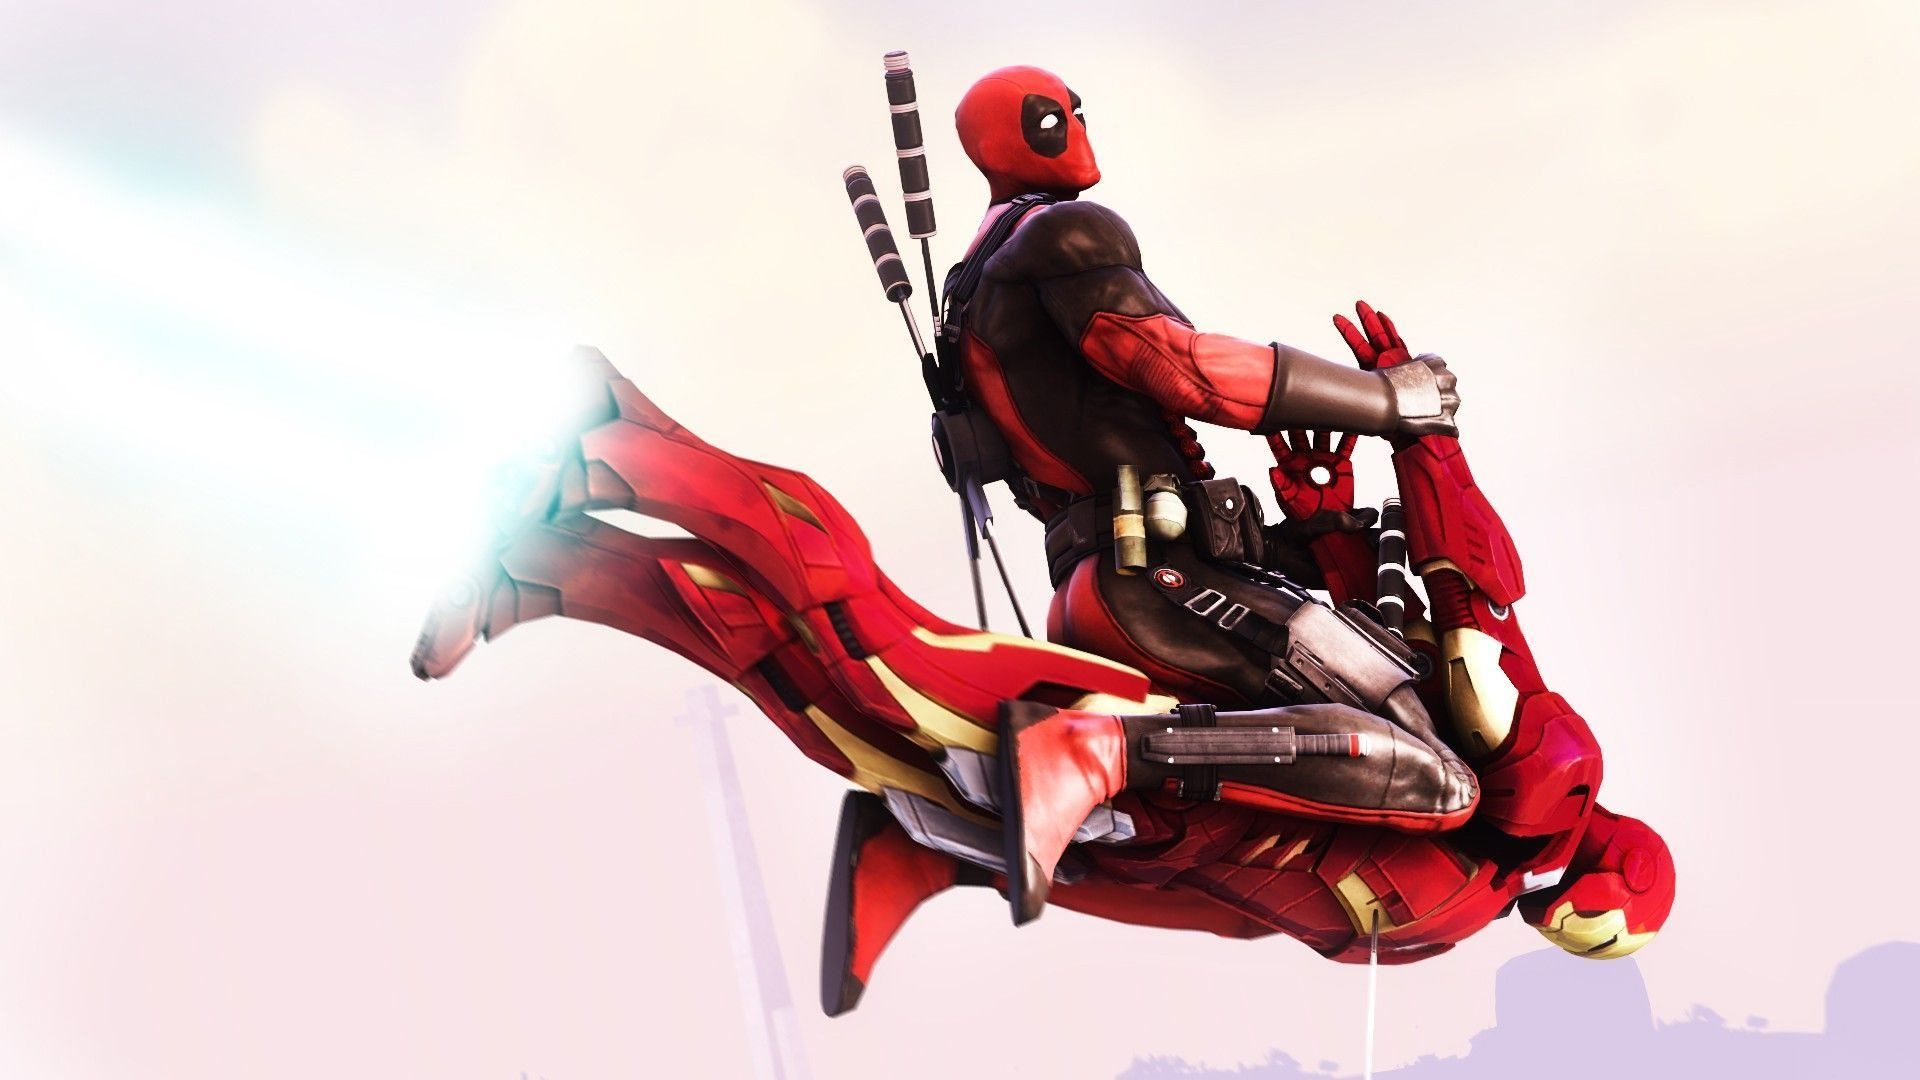 1000 Ideas About Deadpool Hd Wallpaper On Pinterest: Deadpool HD Wallpapers Backgrounds Wallpaper 2400×1500